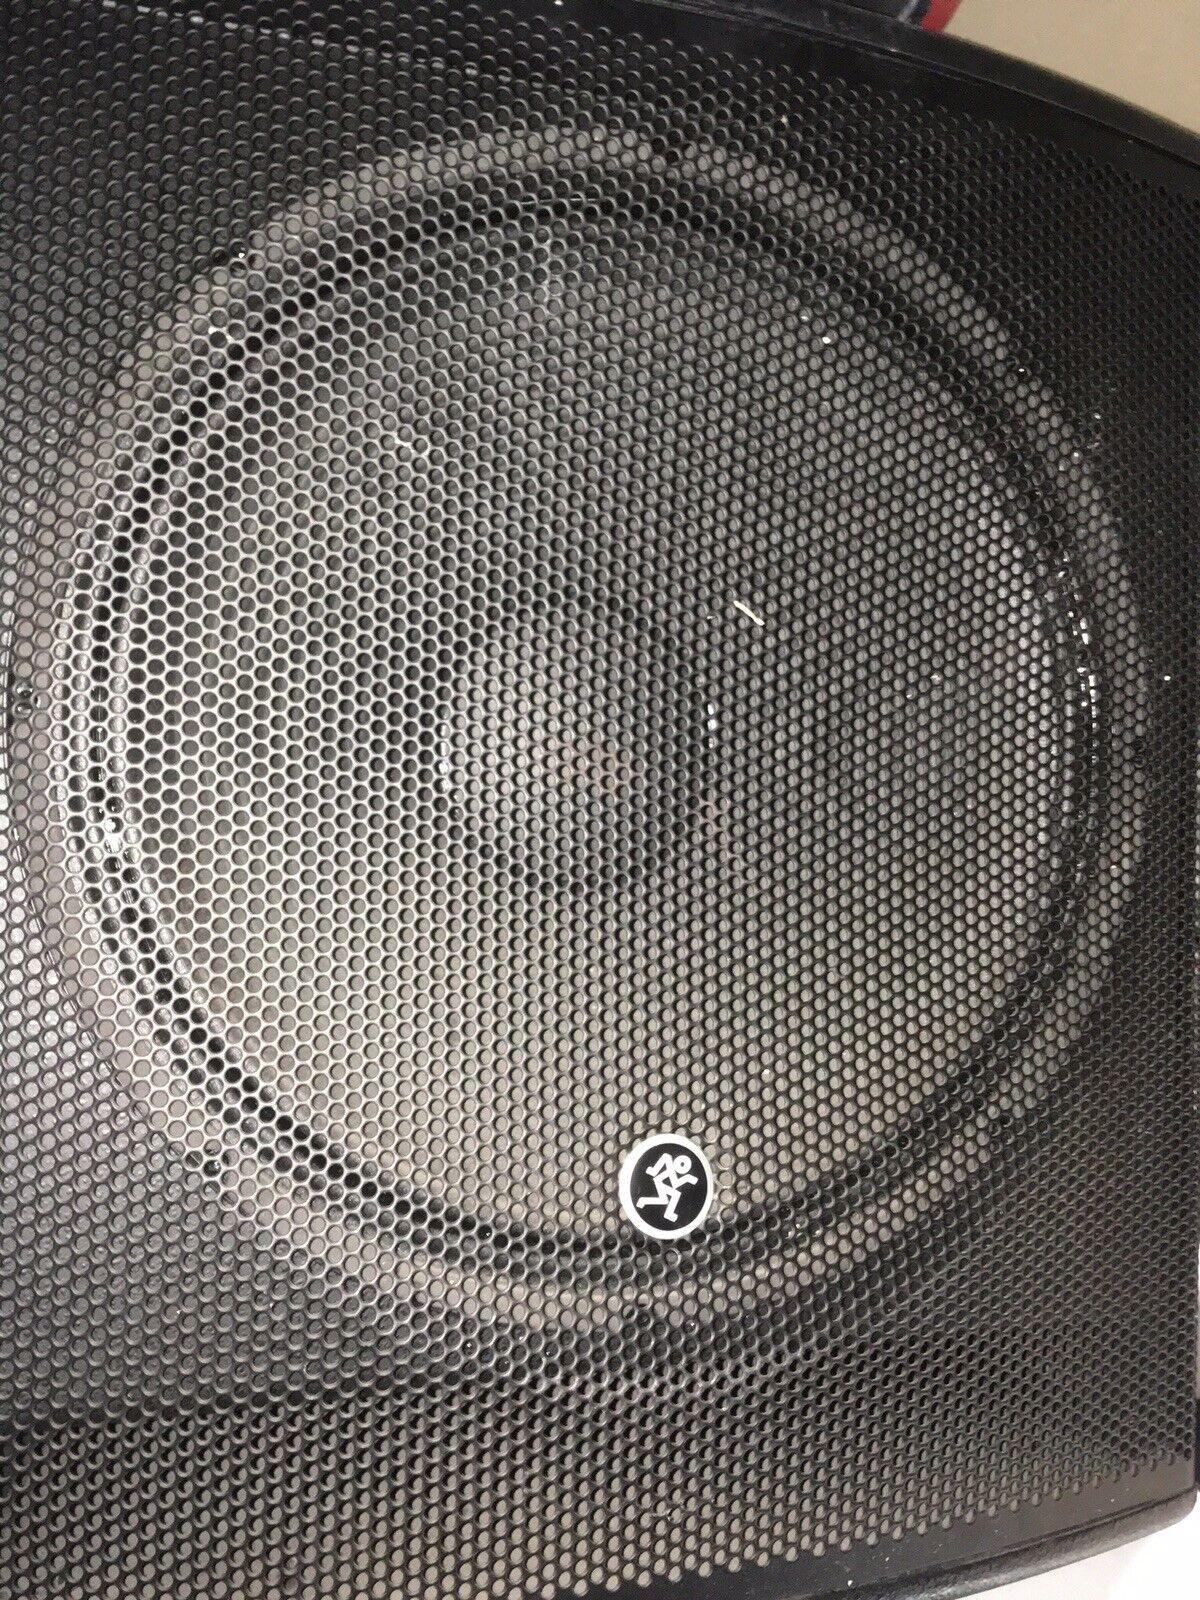 Thump SRM1801 18 Inch Powered Sound Reinforcement Subwoofer EUC